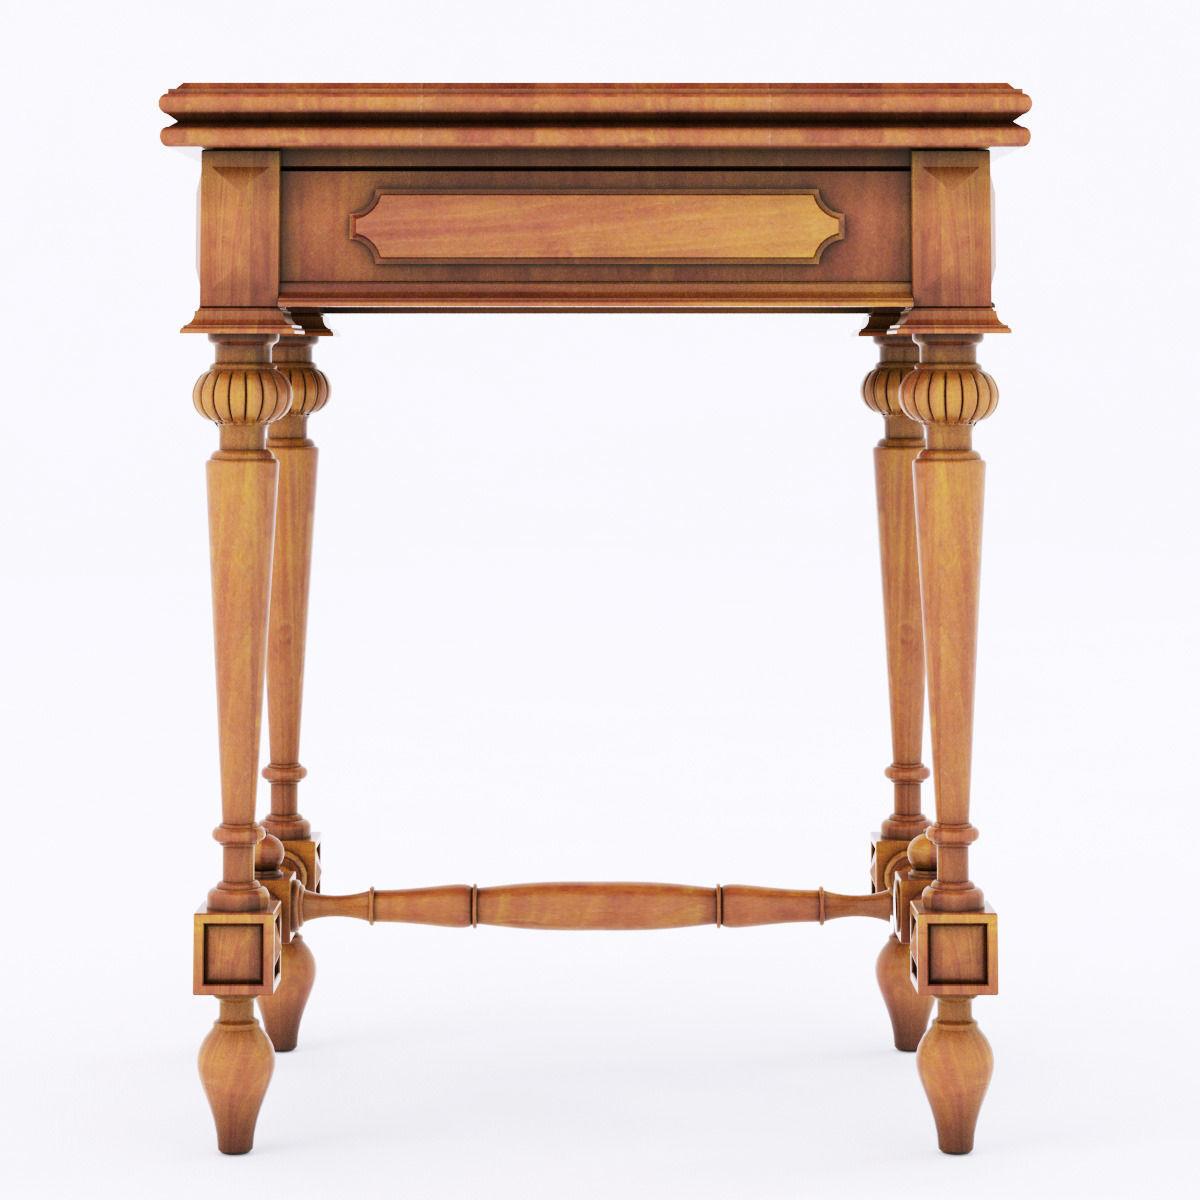 Antique wood table 3d model max obj 3ds fbx mtl for Table 3d model